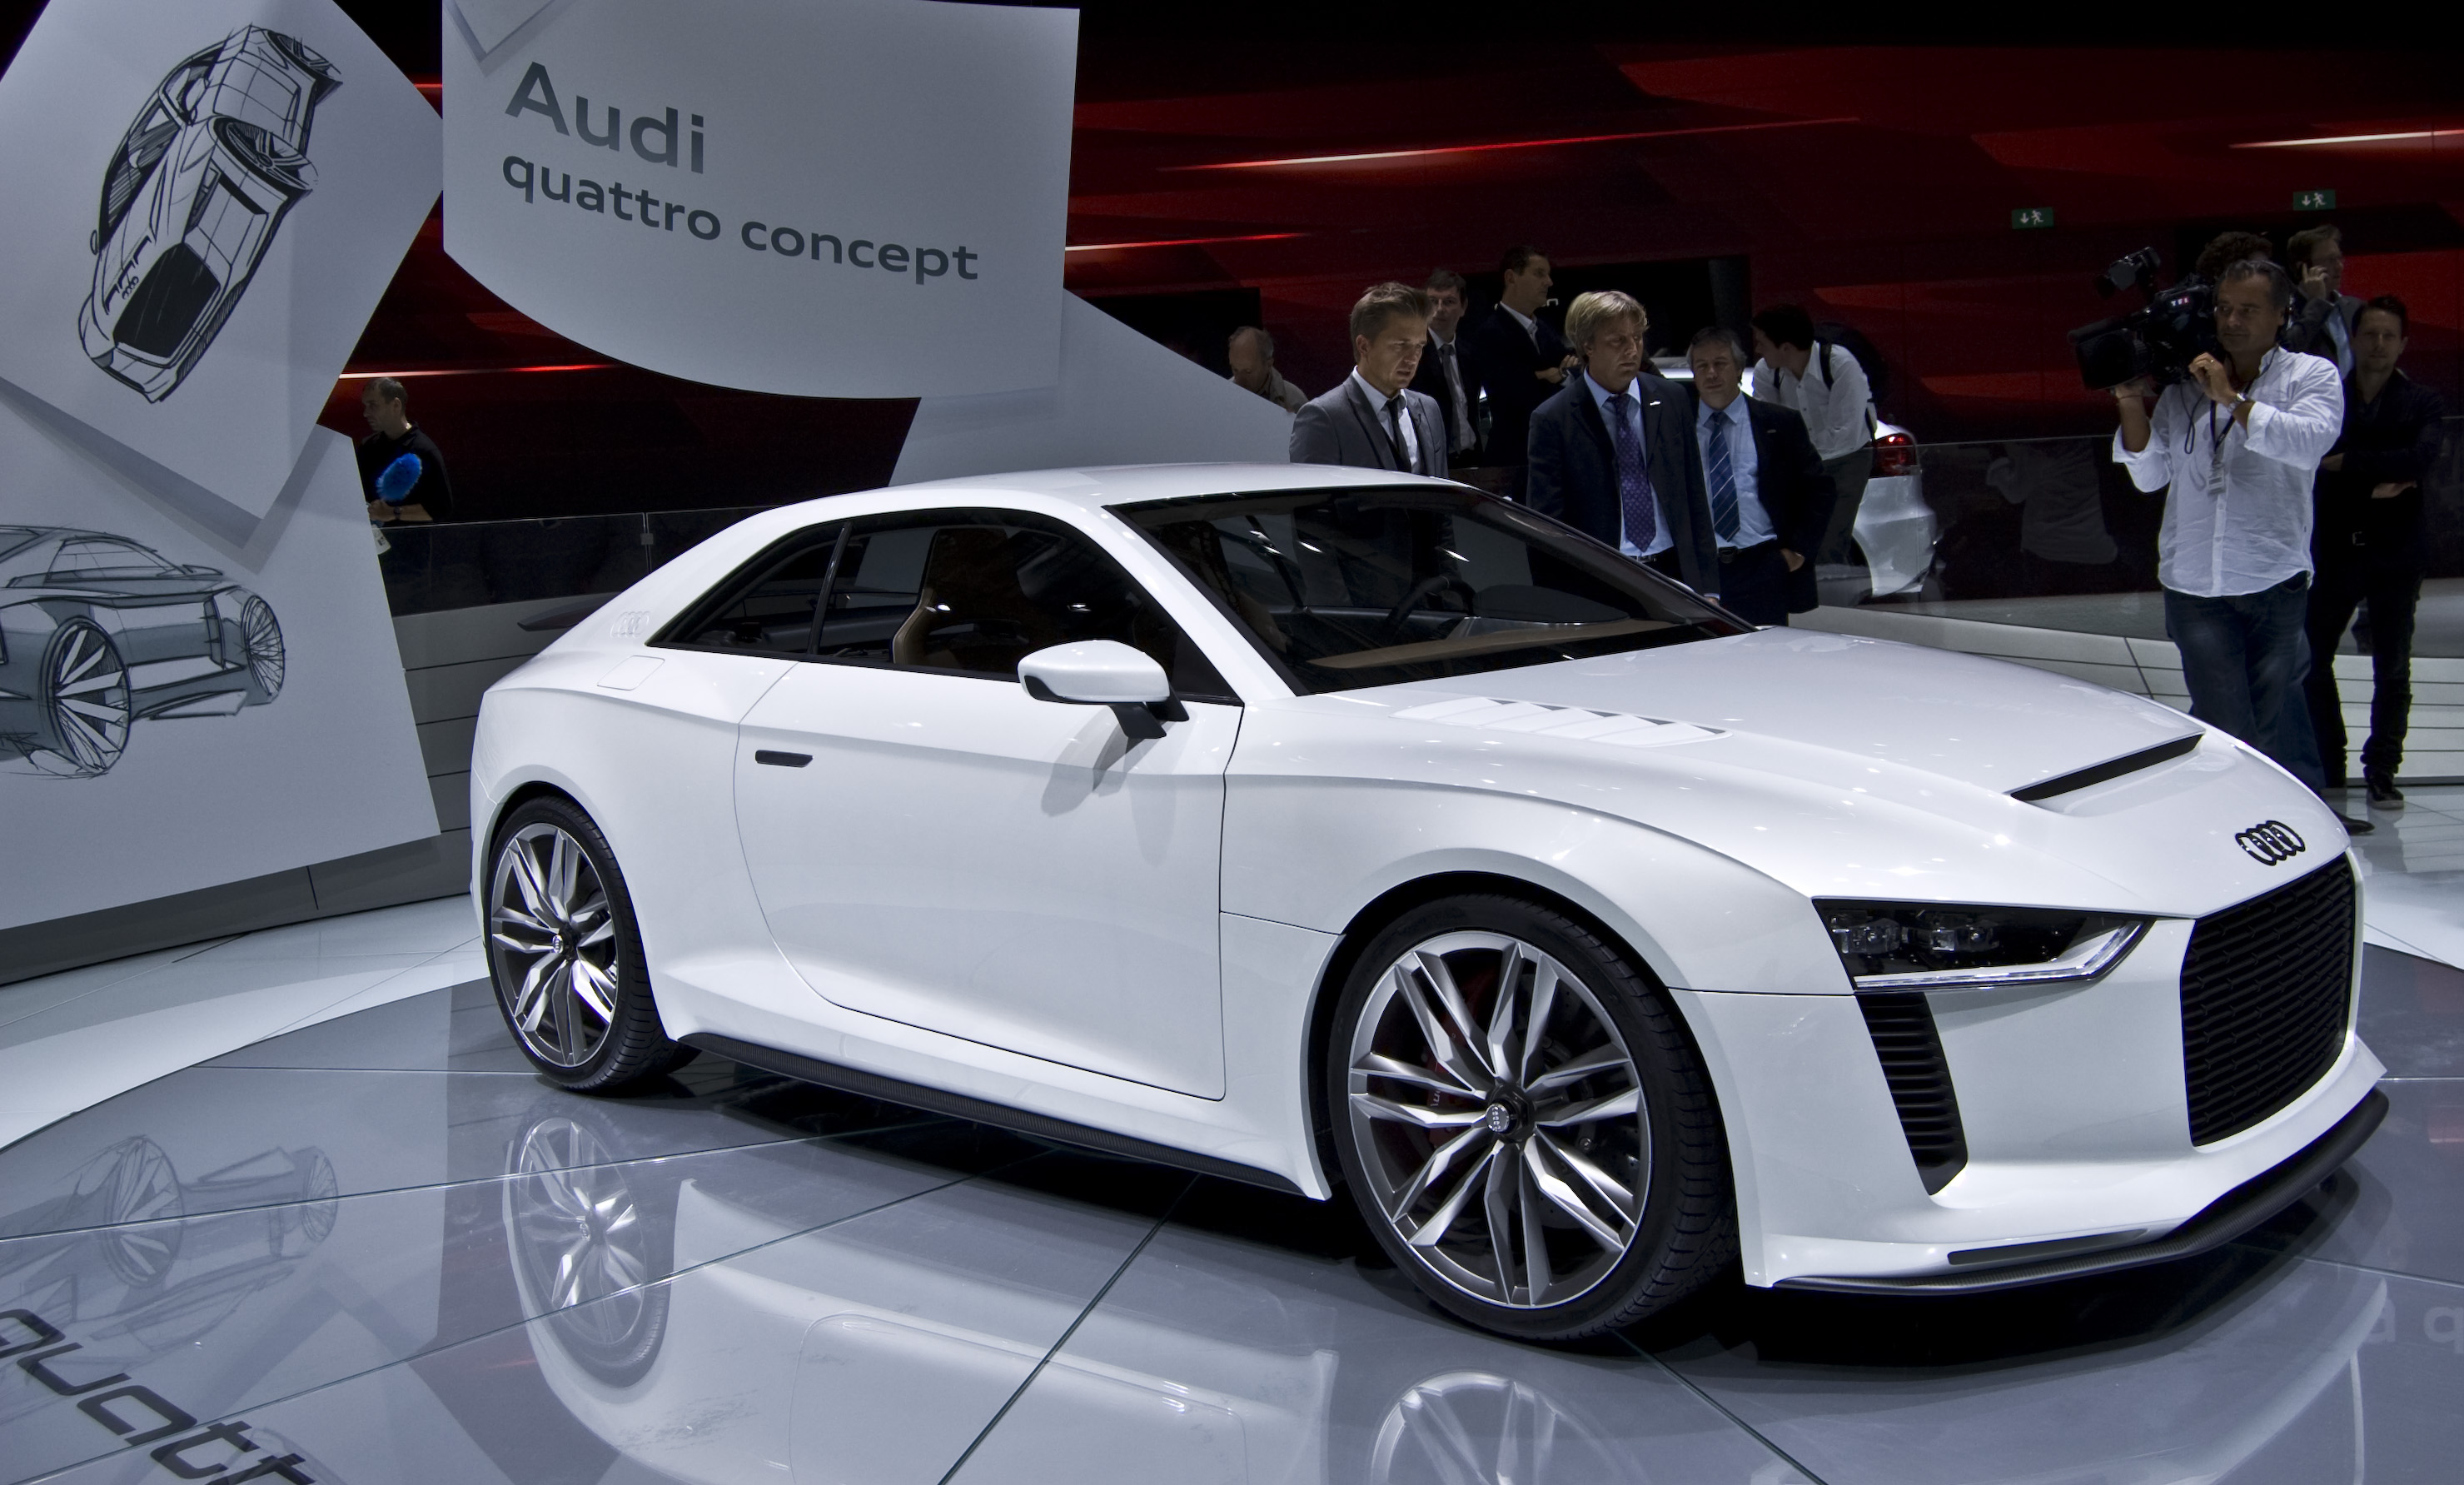 File Audi Quattro Concept Flickr David Villarreal